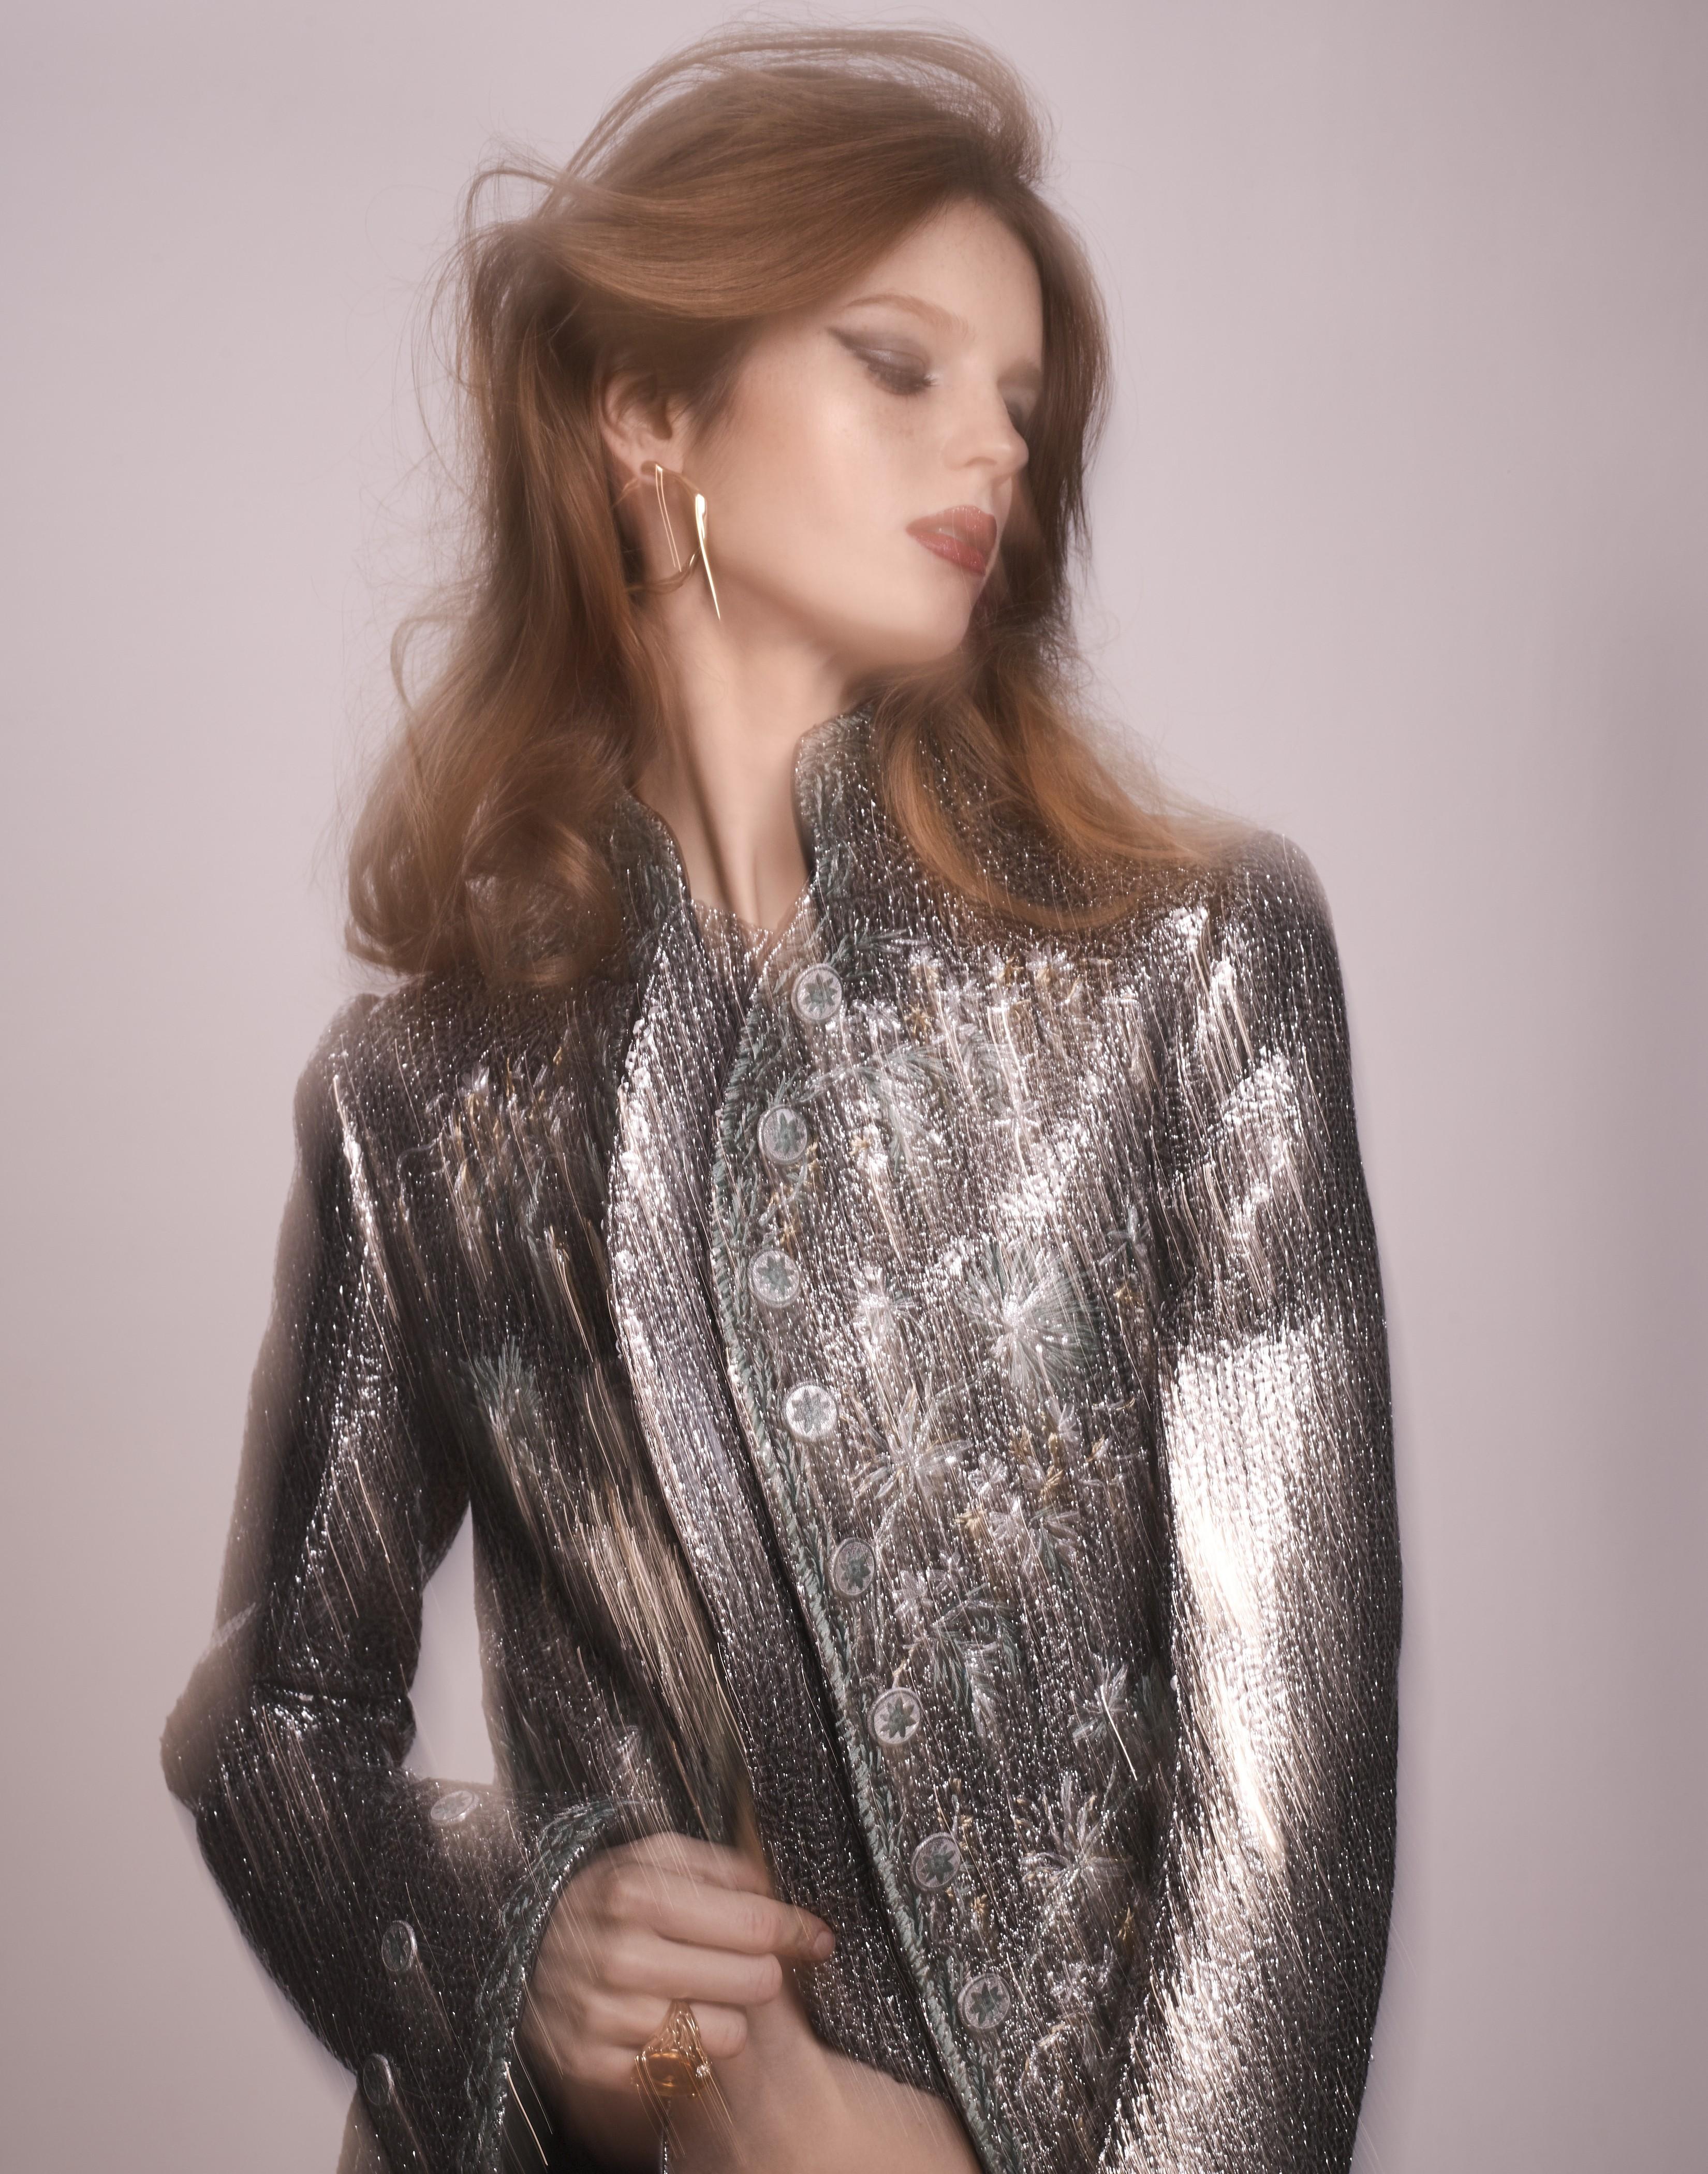 Brinco e anel, Christian Dior; jaqueta, Louis Vuitton. (Foto: Benjamin Kaufmann)